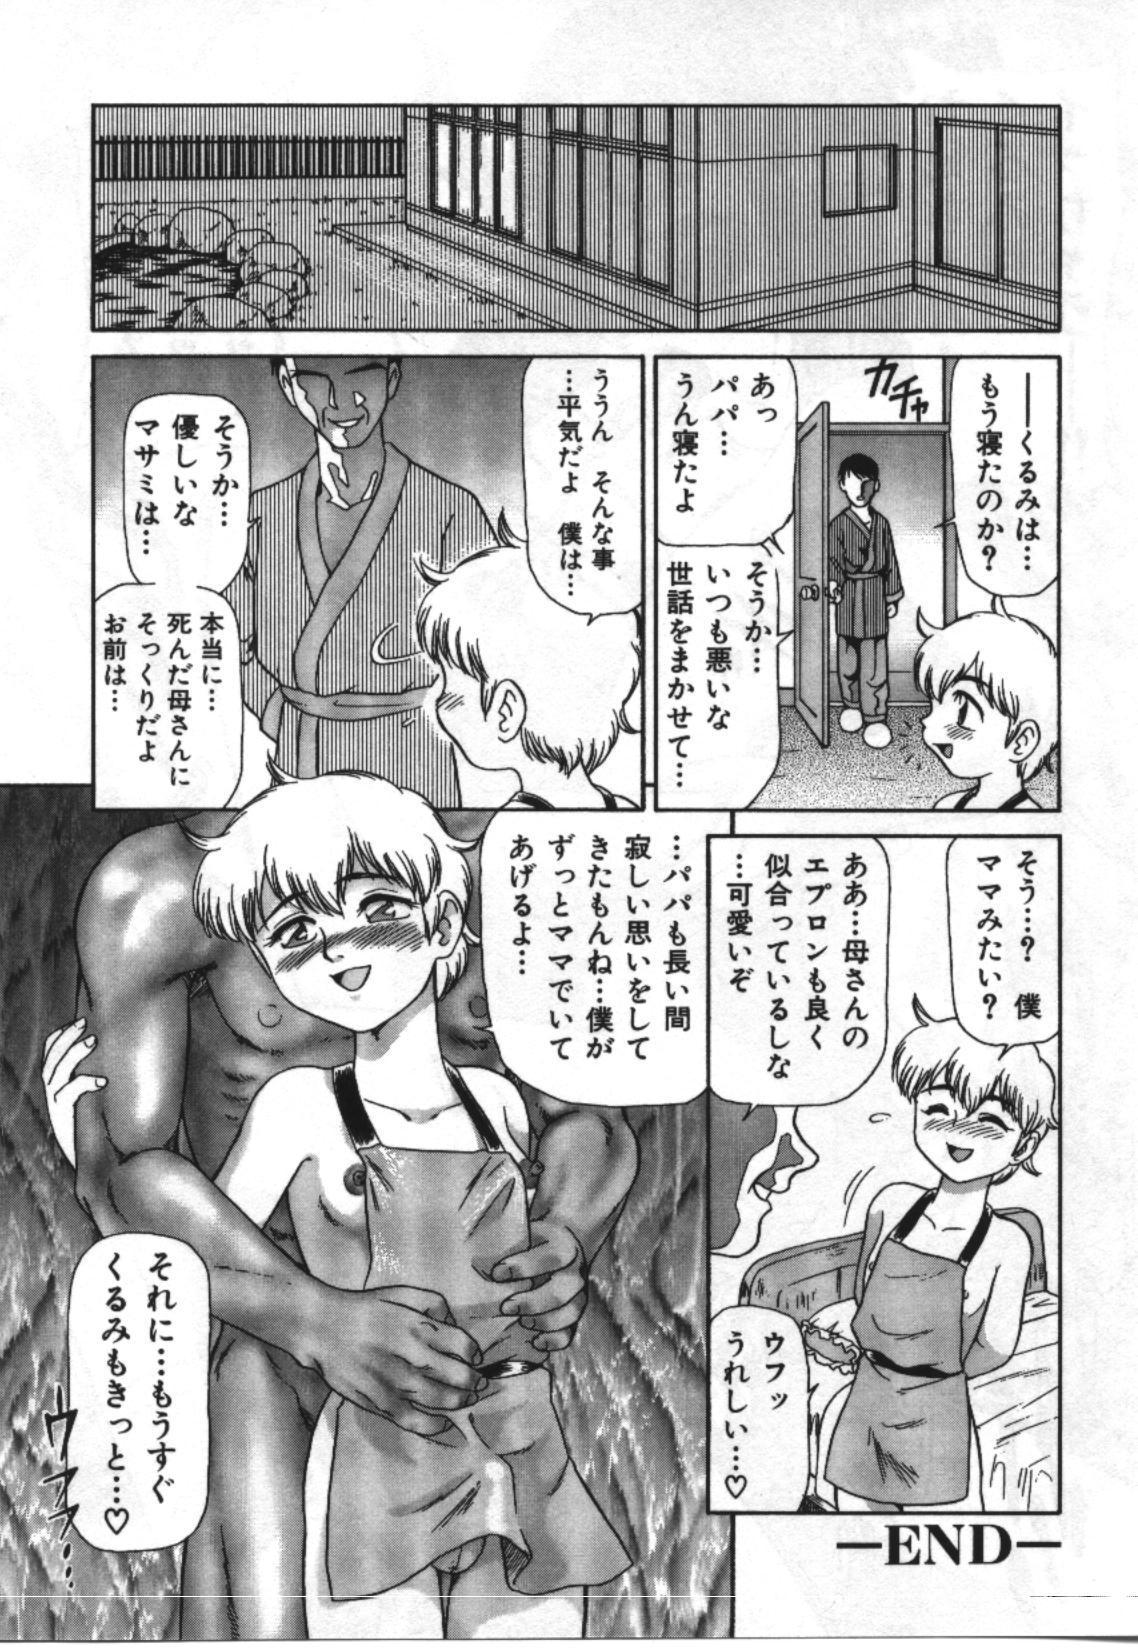 Imouto Koishi 2 29